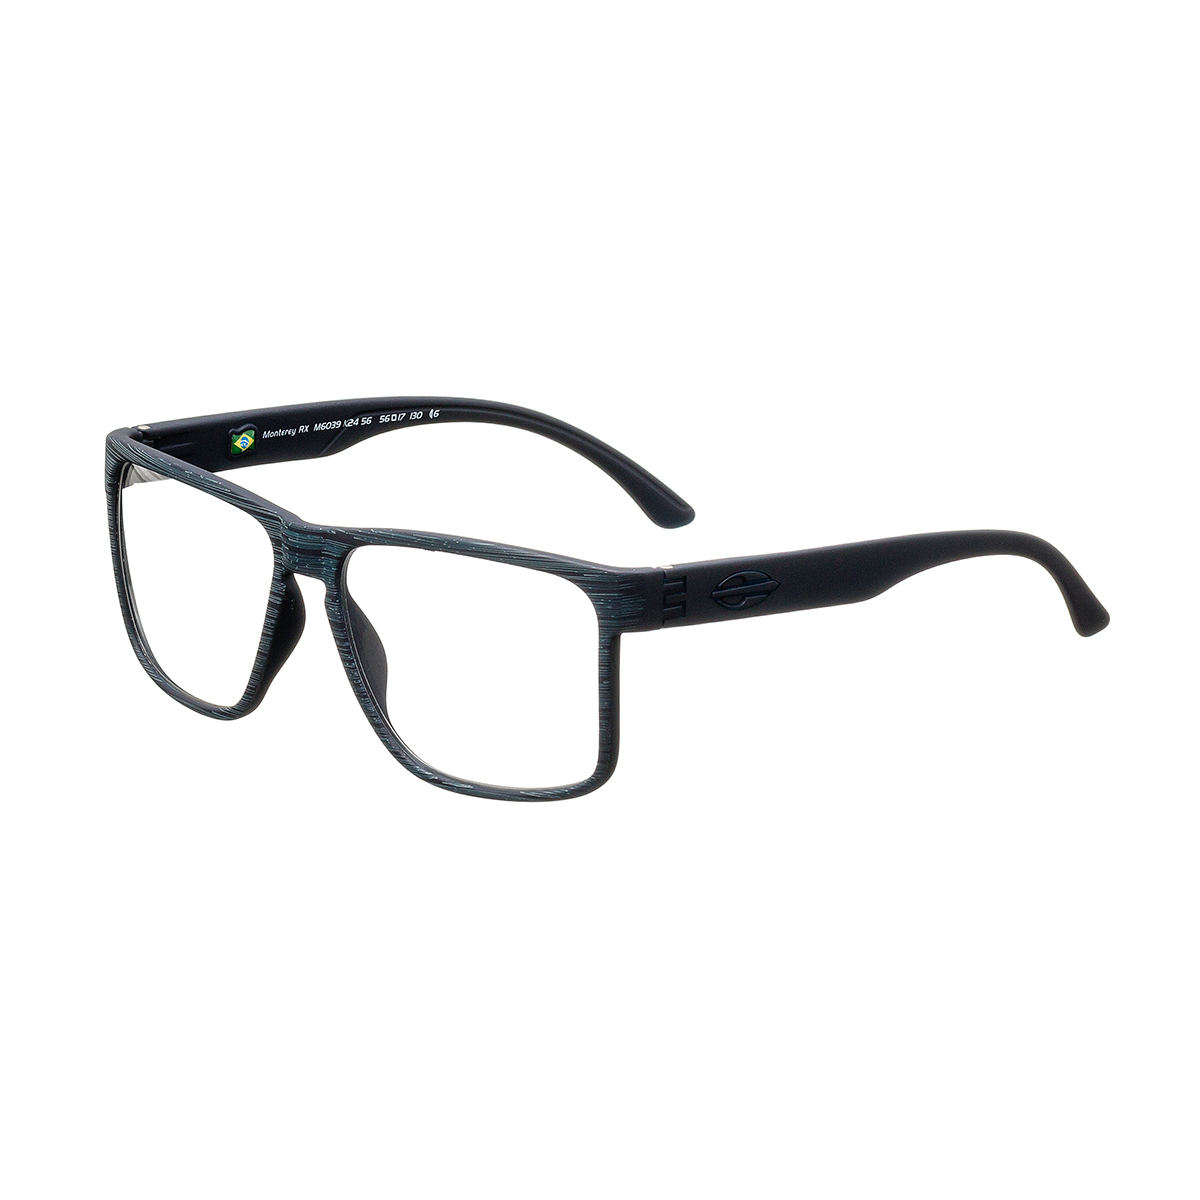 413188fc5 Óculos de Grau Masculino Mormaii Bold M6039 K24 Tam ...